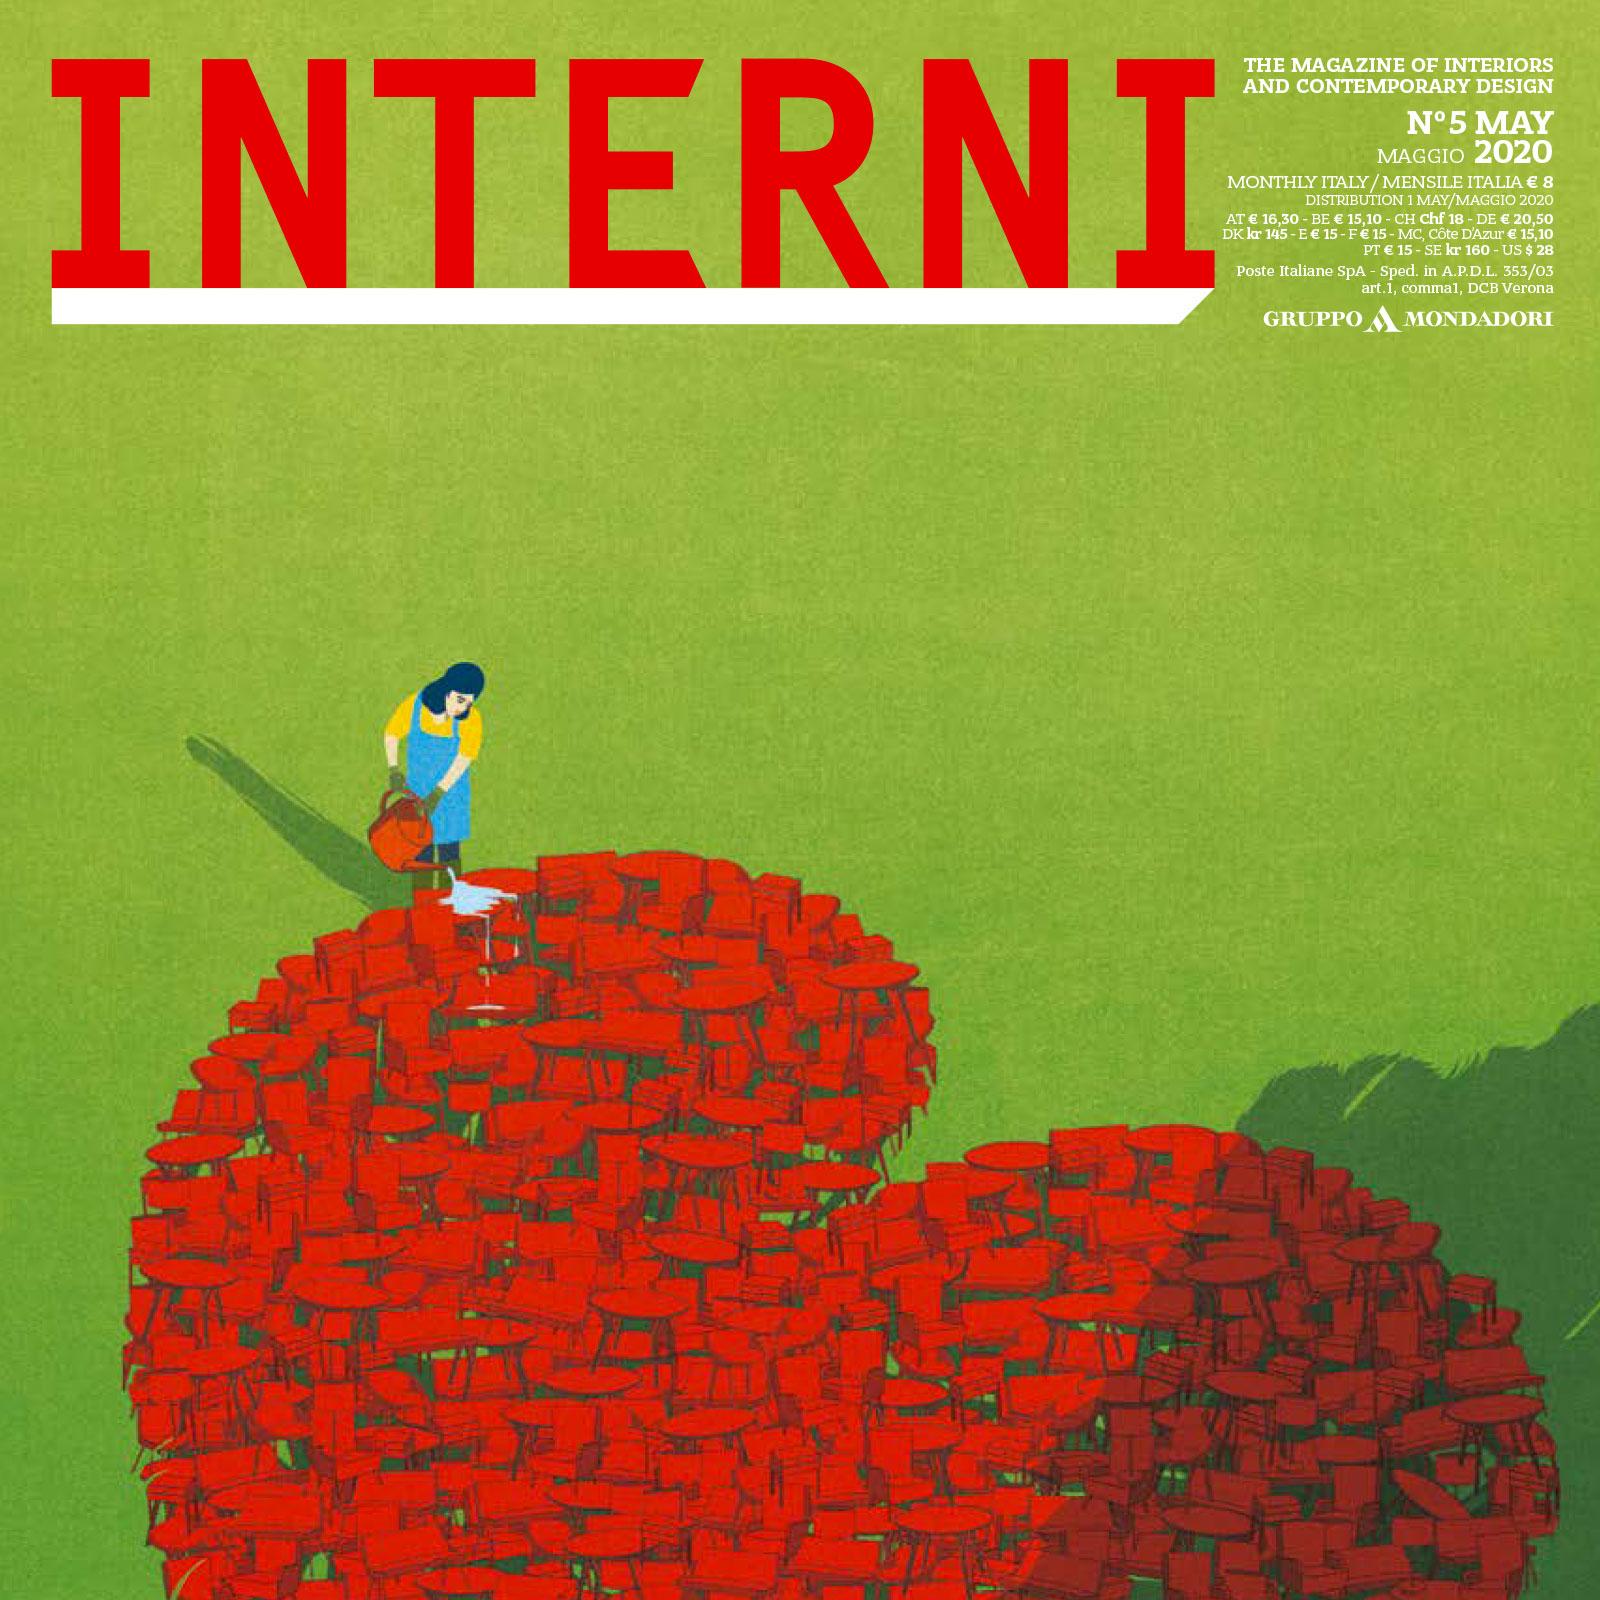 madeamano-press-2020-05-interni-magazine